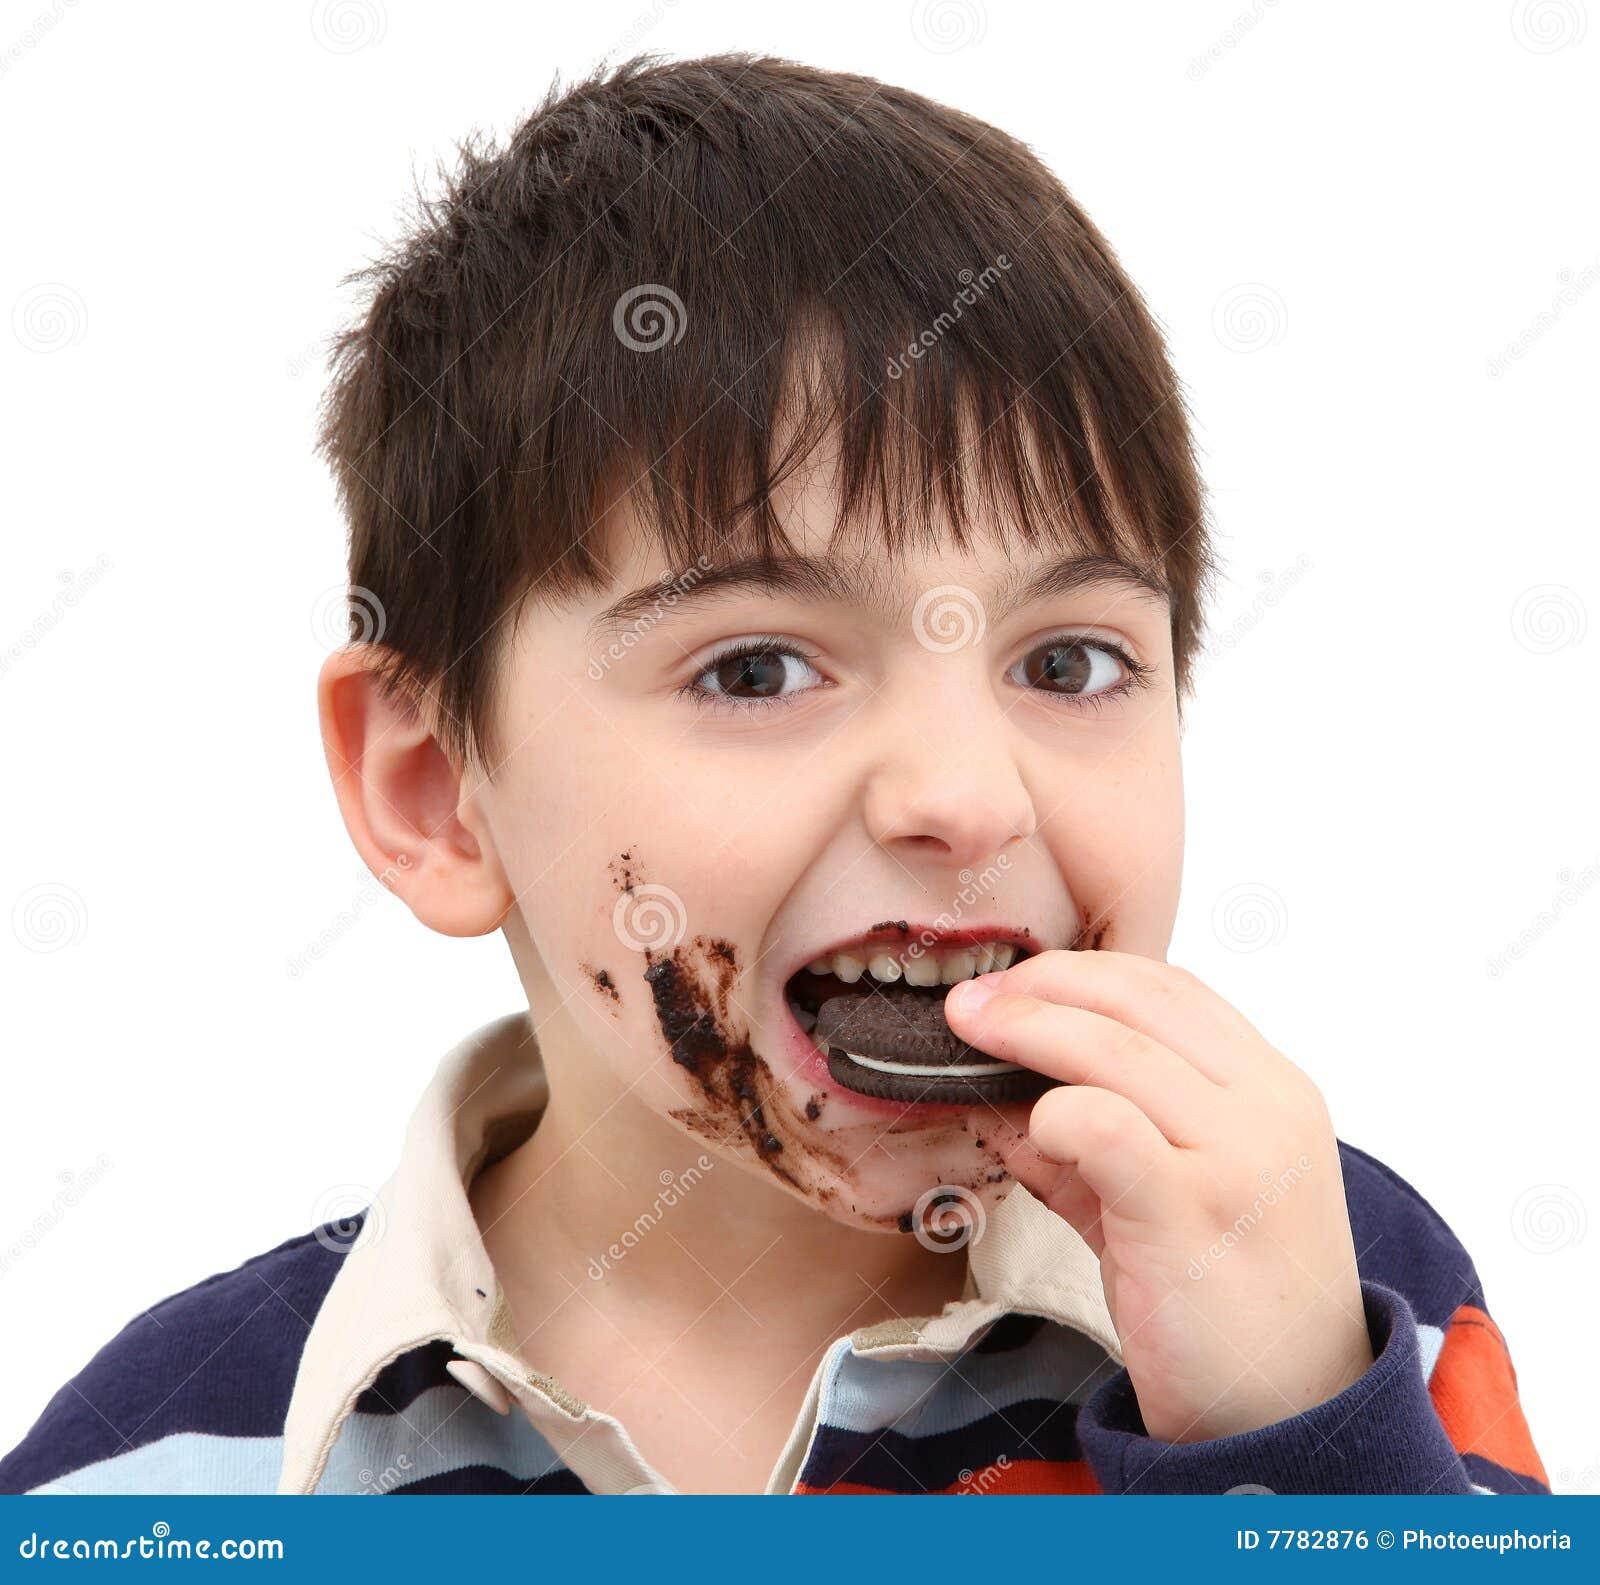 Adorable Boy Eating Cookies Stock Photo Image 7782876